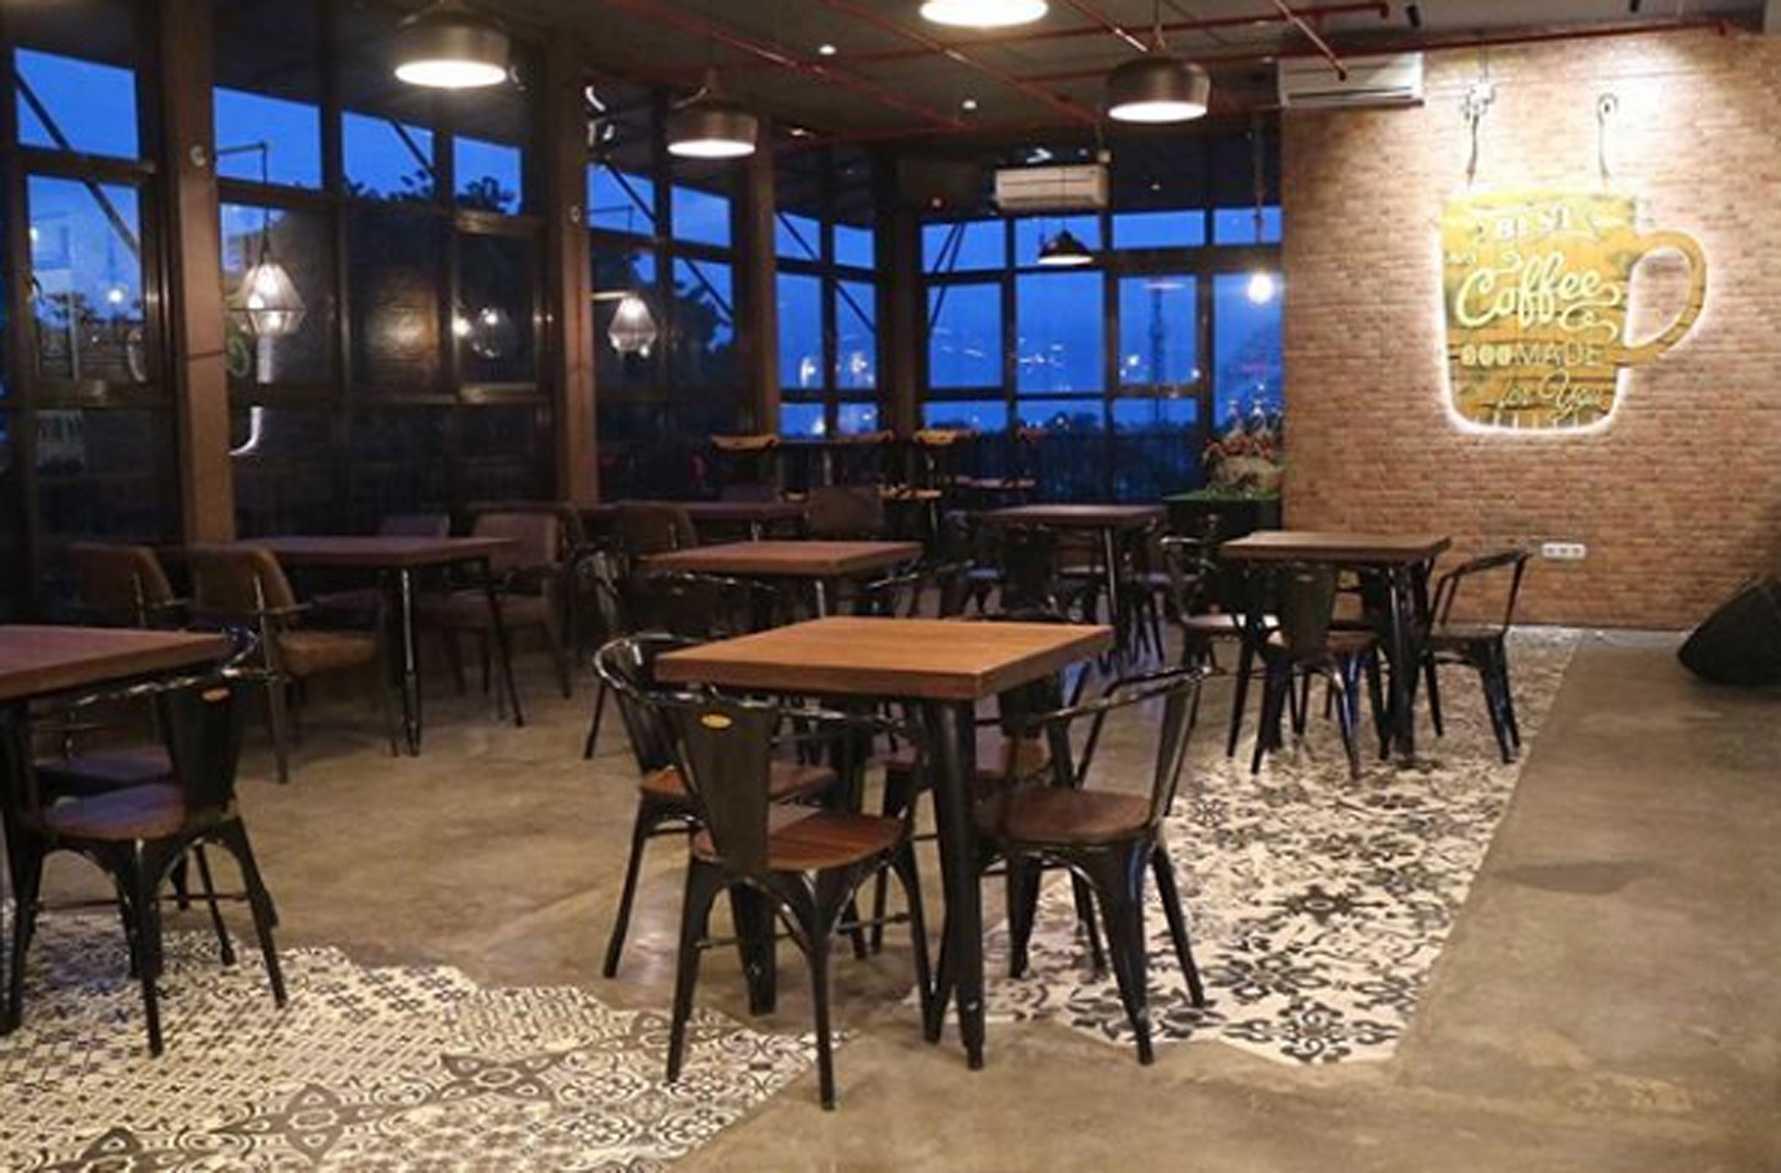 Josaf Sayoko Kafe La Costa Kabupaten Banyuwangi, Jawa Timur, Indonesia Kabupaten Banyuwangi, Jawa Timur, Indonesia Josaf-Sayoko-Kafe-La-Costa Industrial  57634